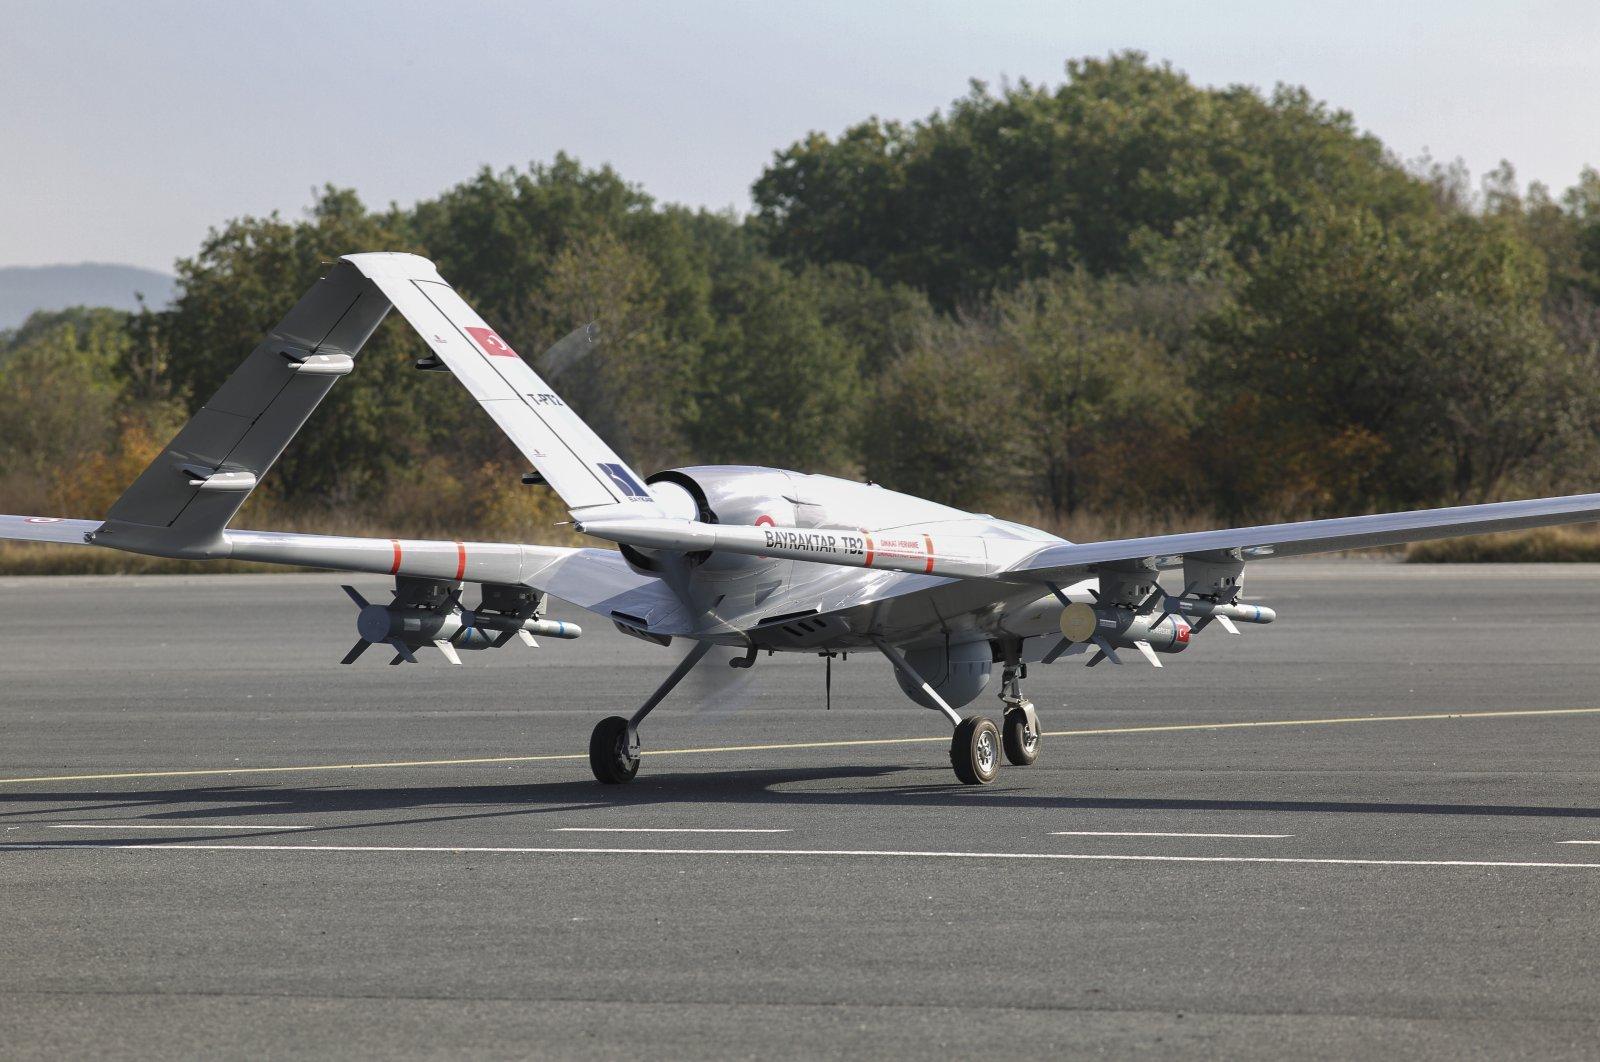 Baykar's Bayraktar TB2 combat drone seen in Istanbul, Turkey, May 24, 2021. (IHA Photo)